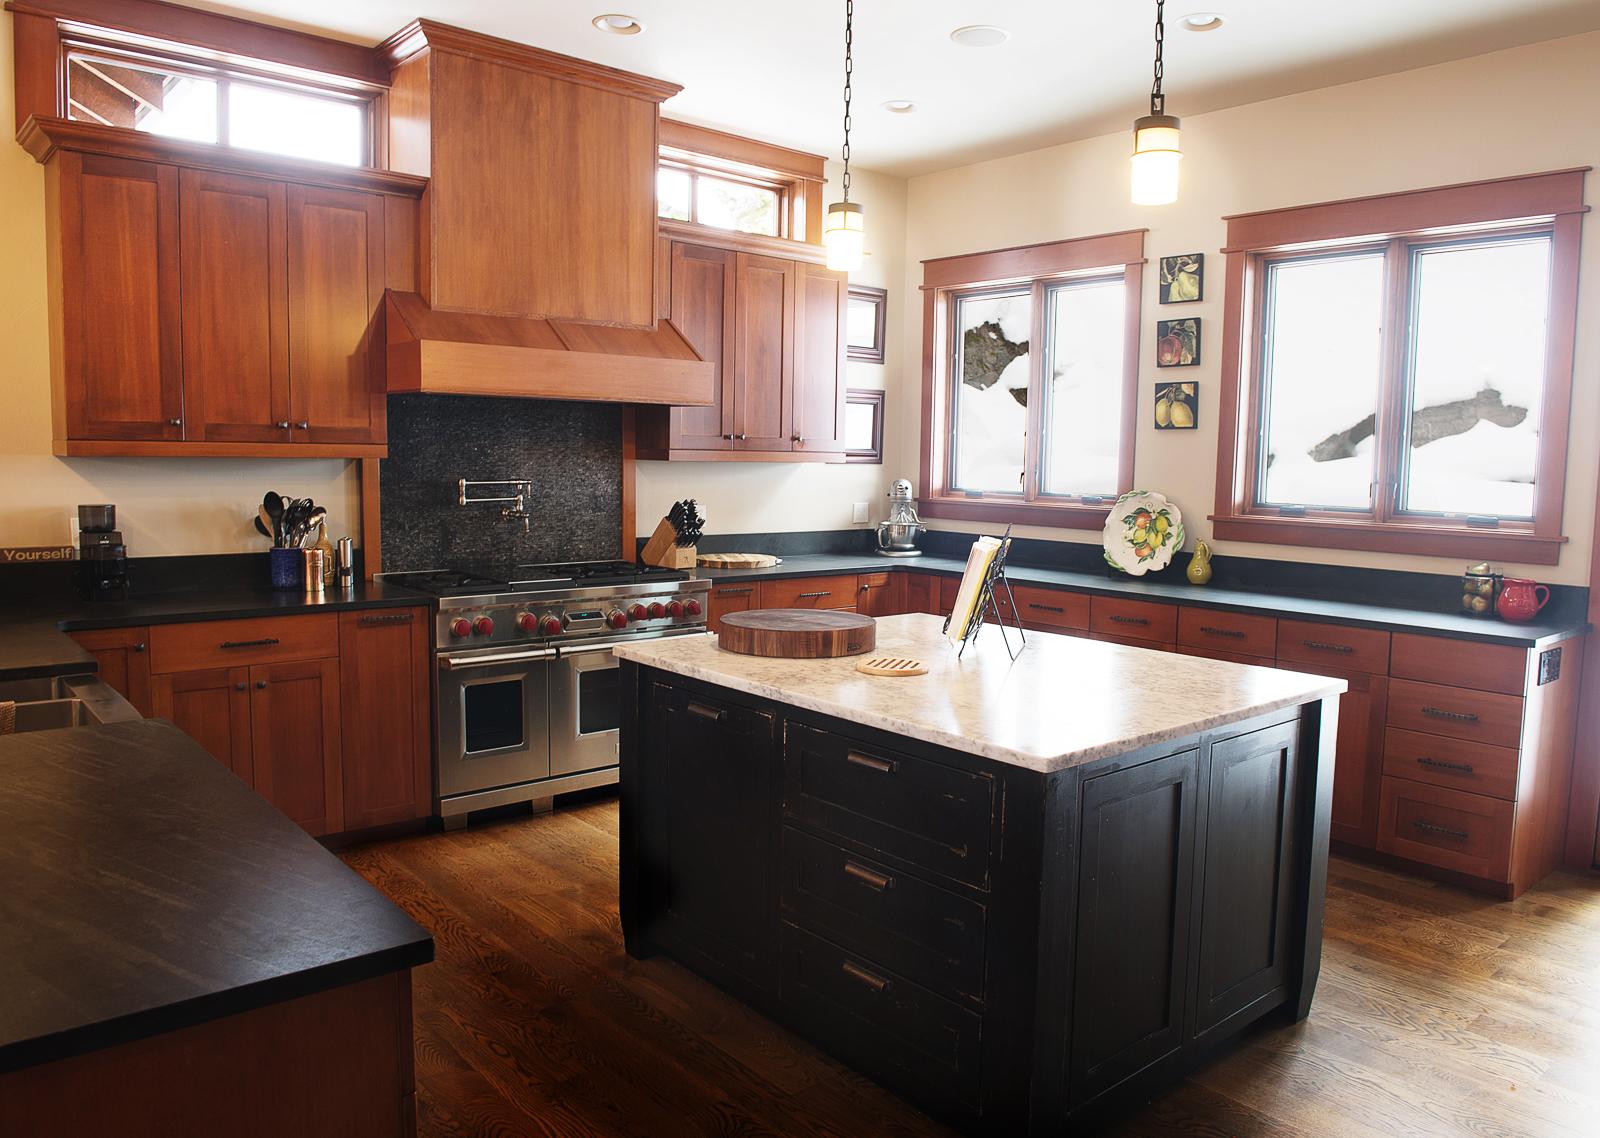 Woodworks-West-Bozeman-Montana-Builder-Cabinetry-Remodel-New-Construction-3534.jpg